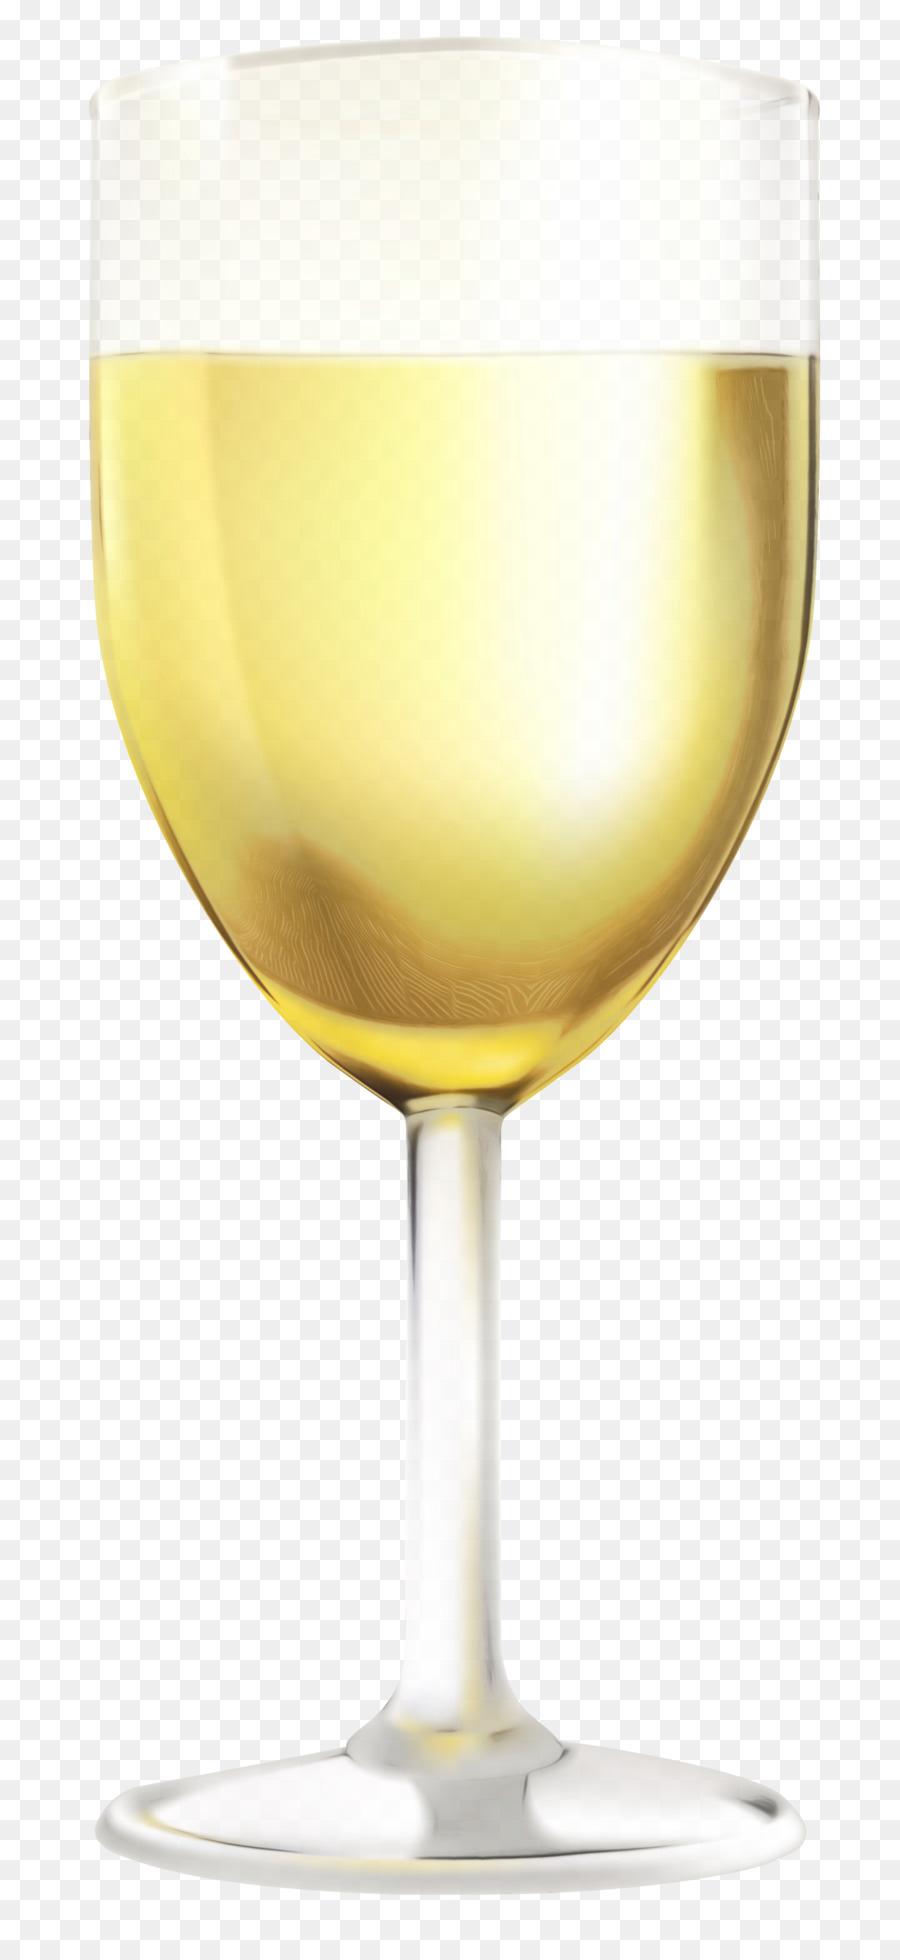 Descarga gratuita de Copa De Vino, Vino, Vino Tinto Imágen de Png